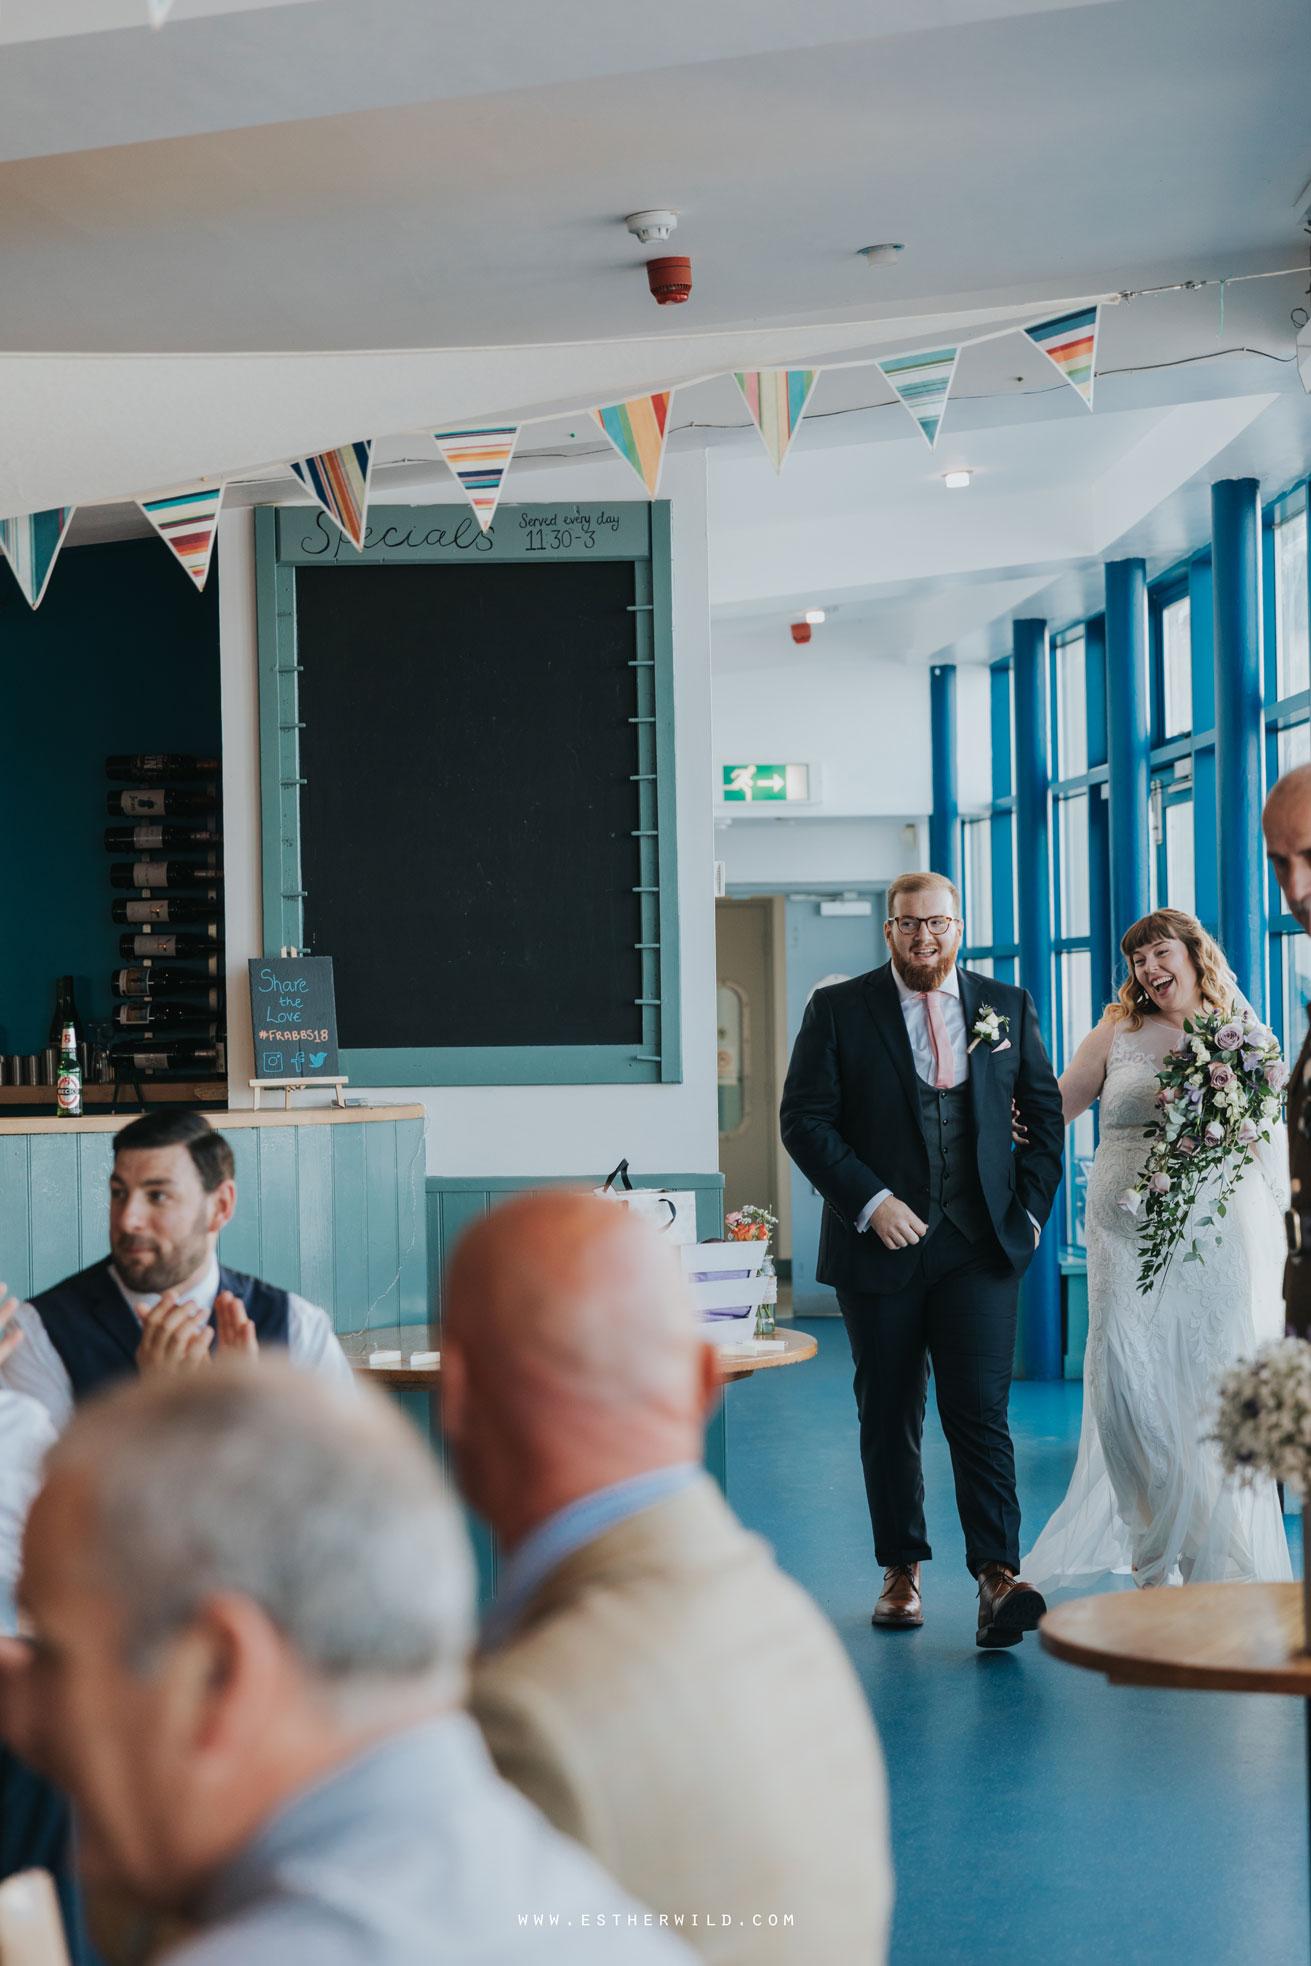 Cromer_Wedding_Beach_Outdoor_Ceremony_Norfolk_North_Lodge_Registry_Office_Rocket_House_Cafe_Cromer_Pier_IMG_4870.jpg